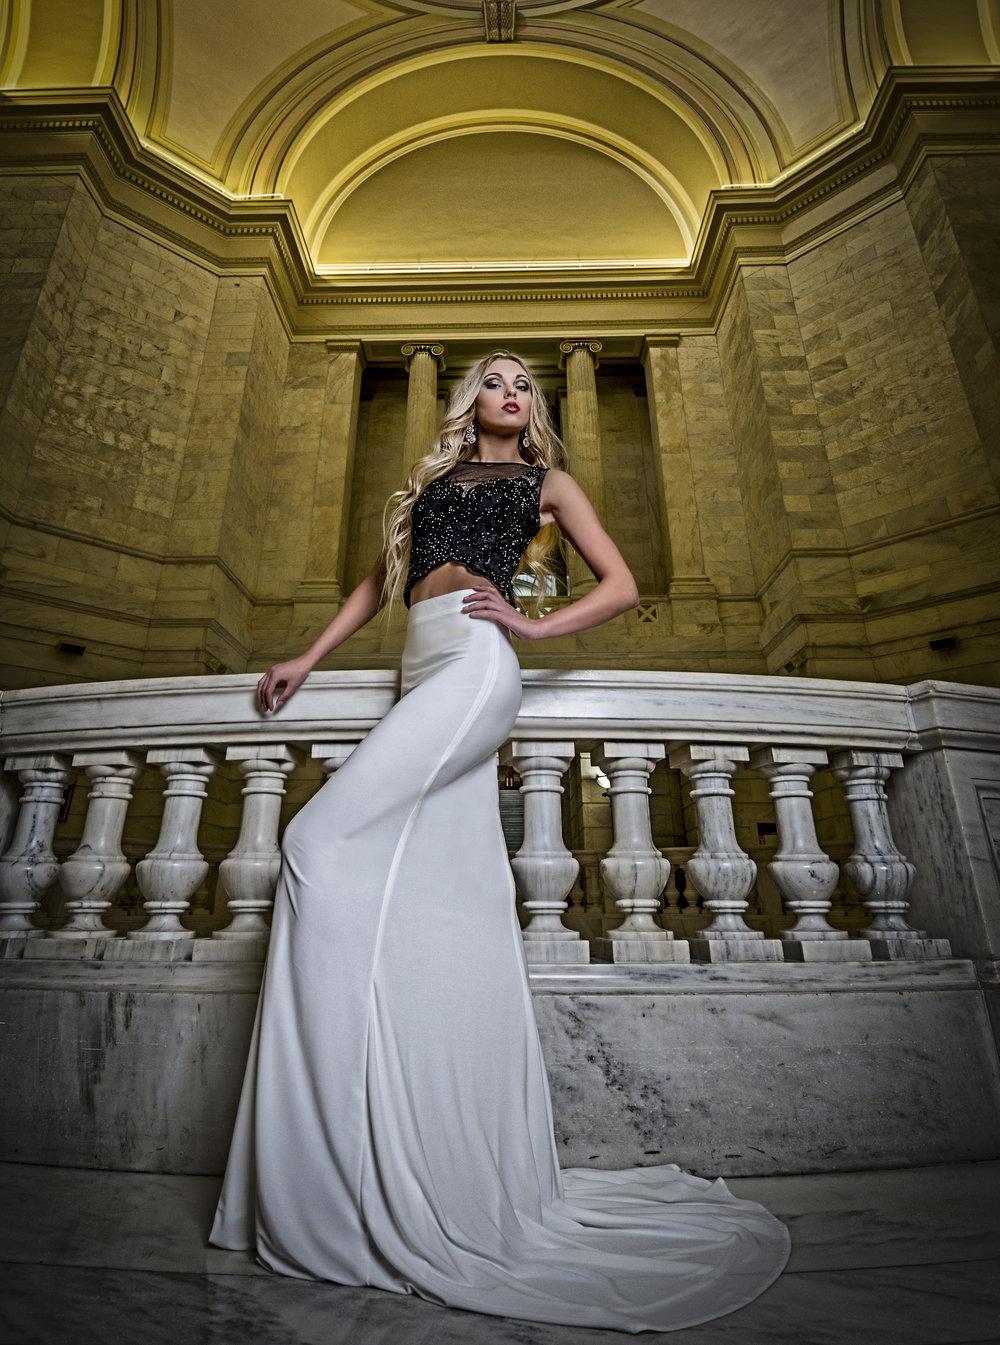 fashion-arkansas-state-capital-jodie-kelly.jpg